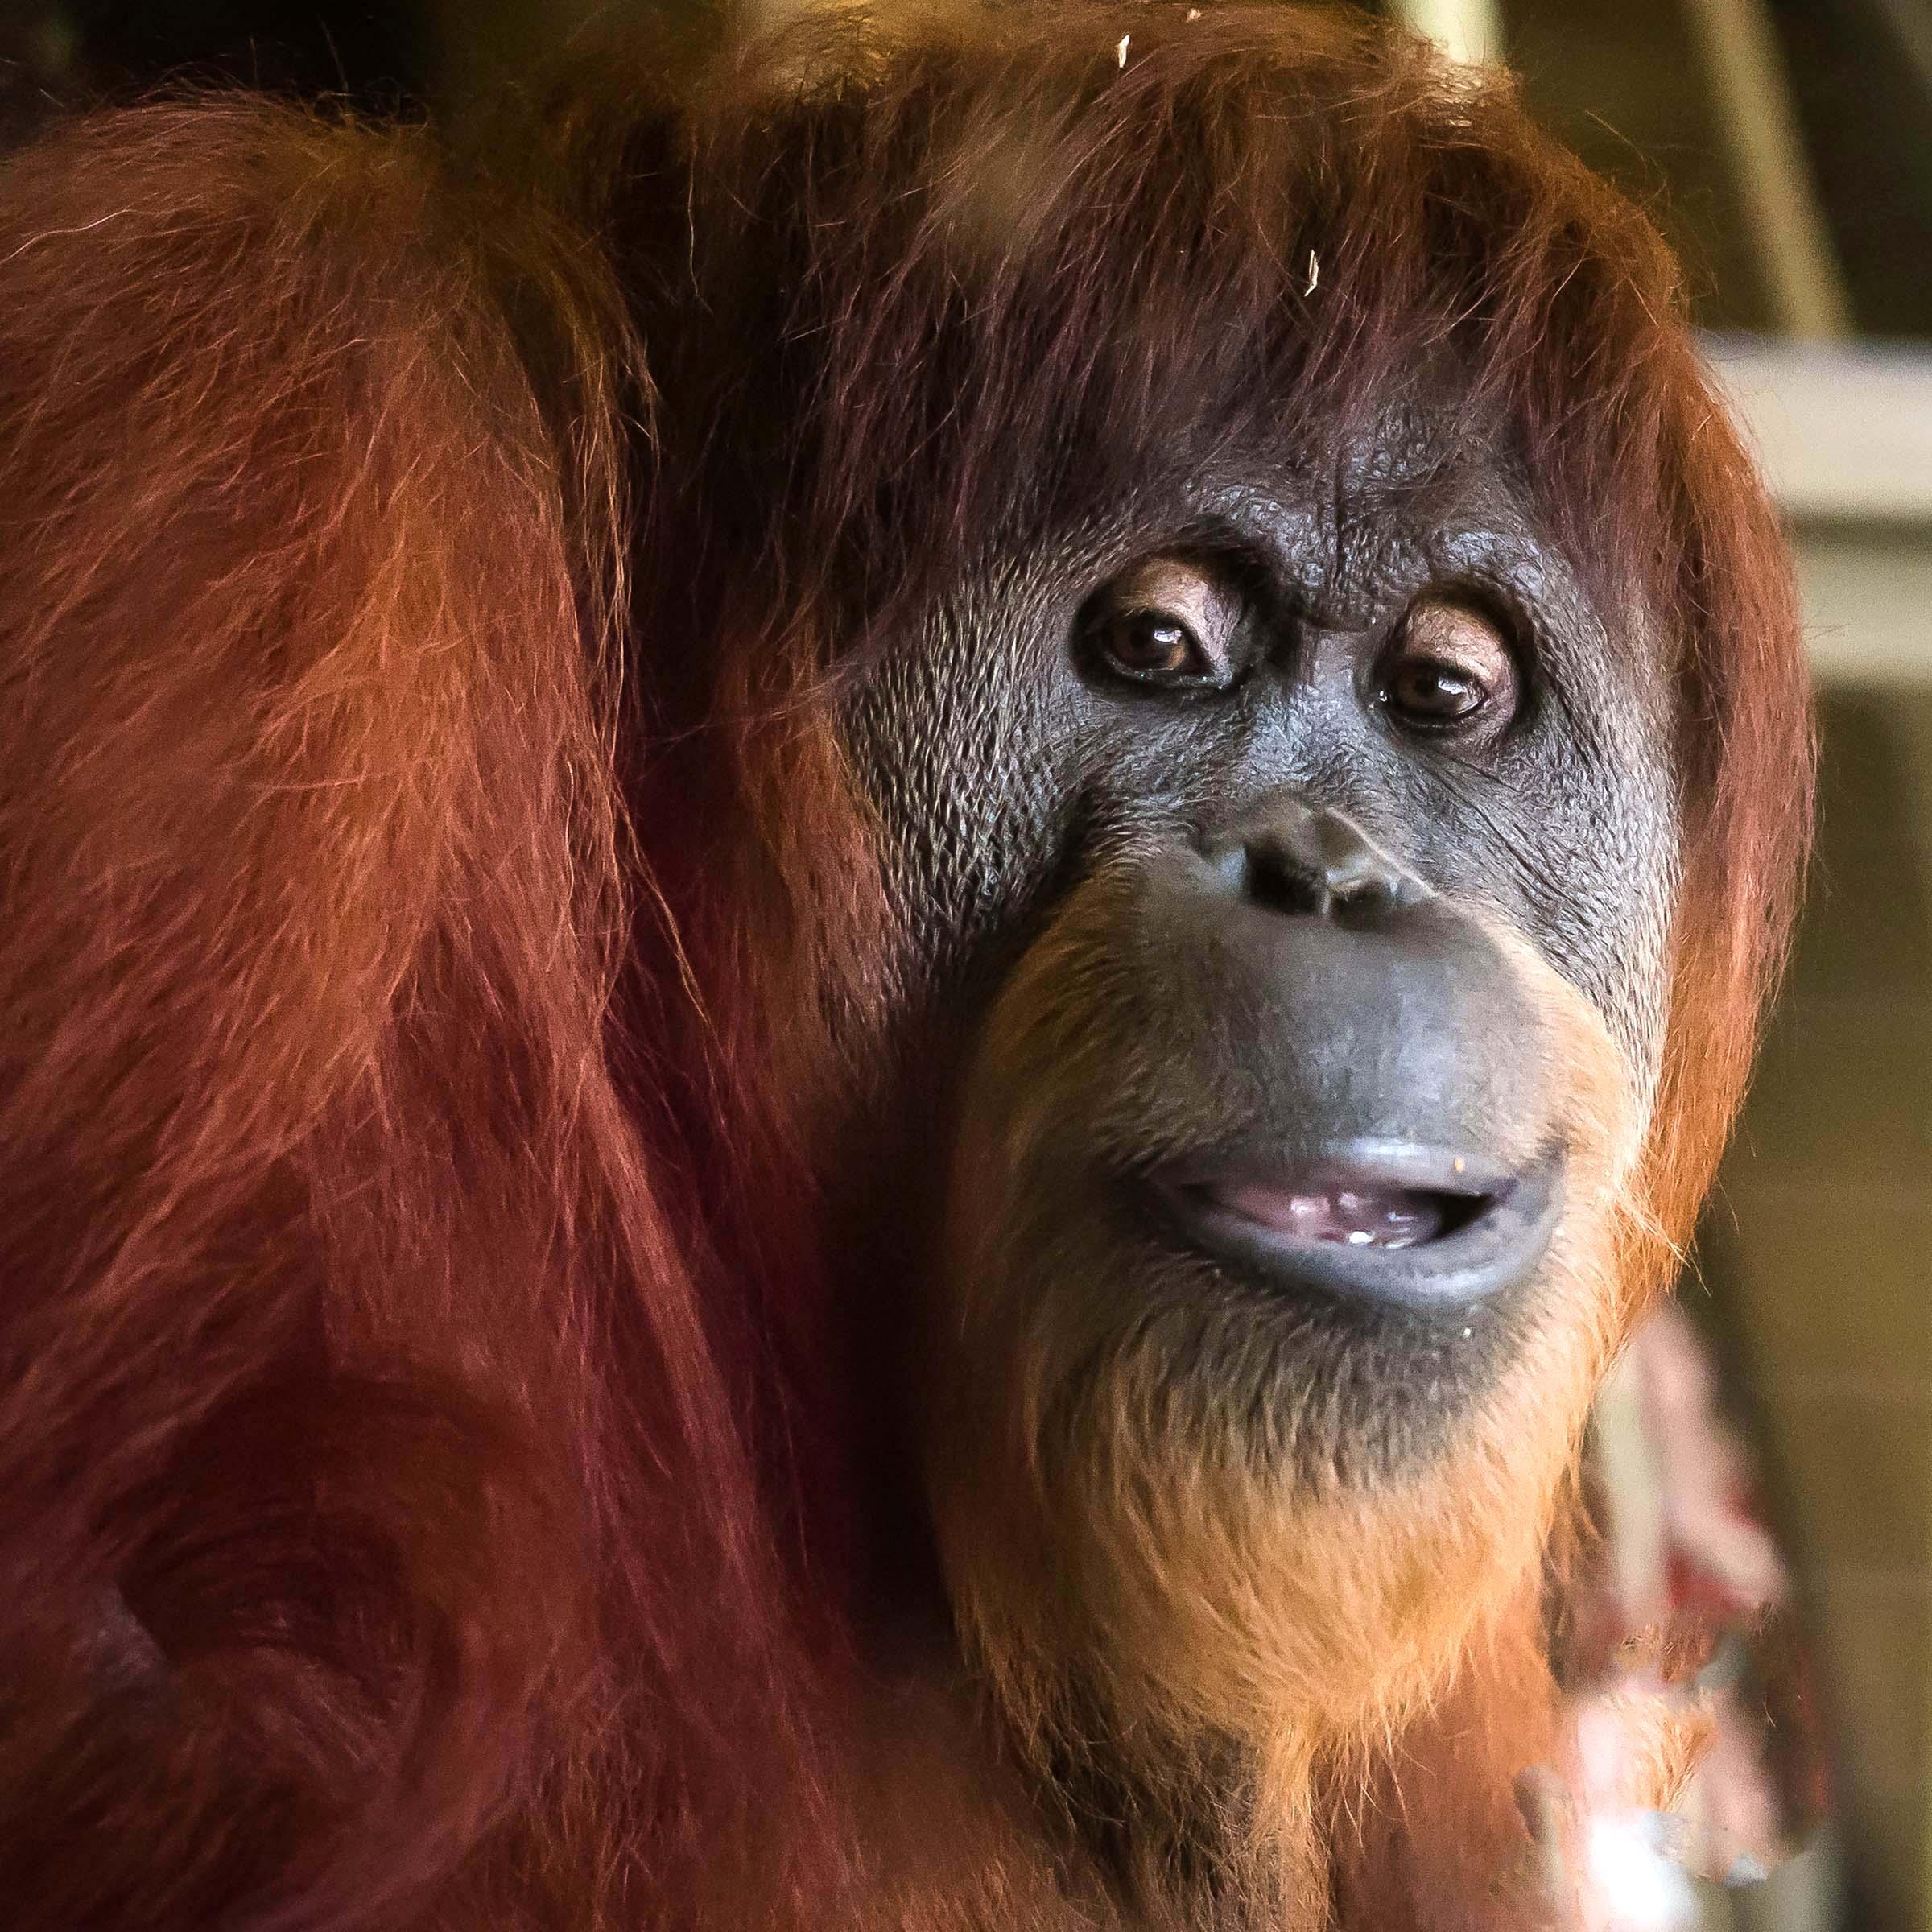 Orangutans - Barrington 2-03426.jpg